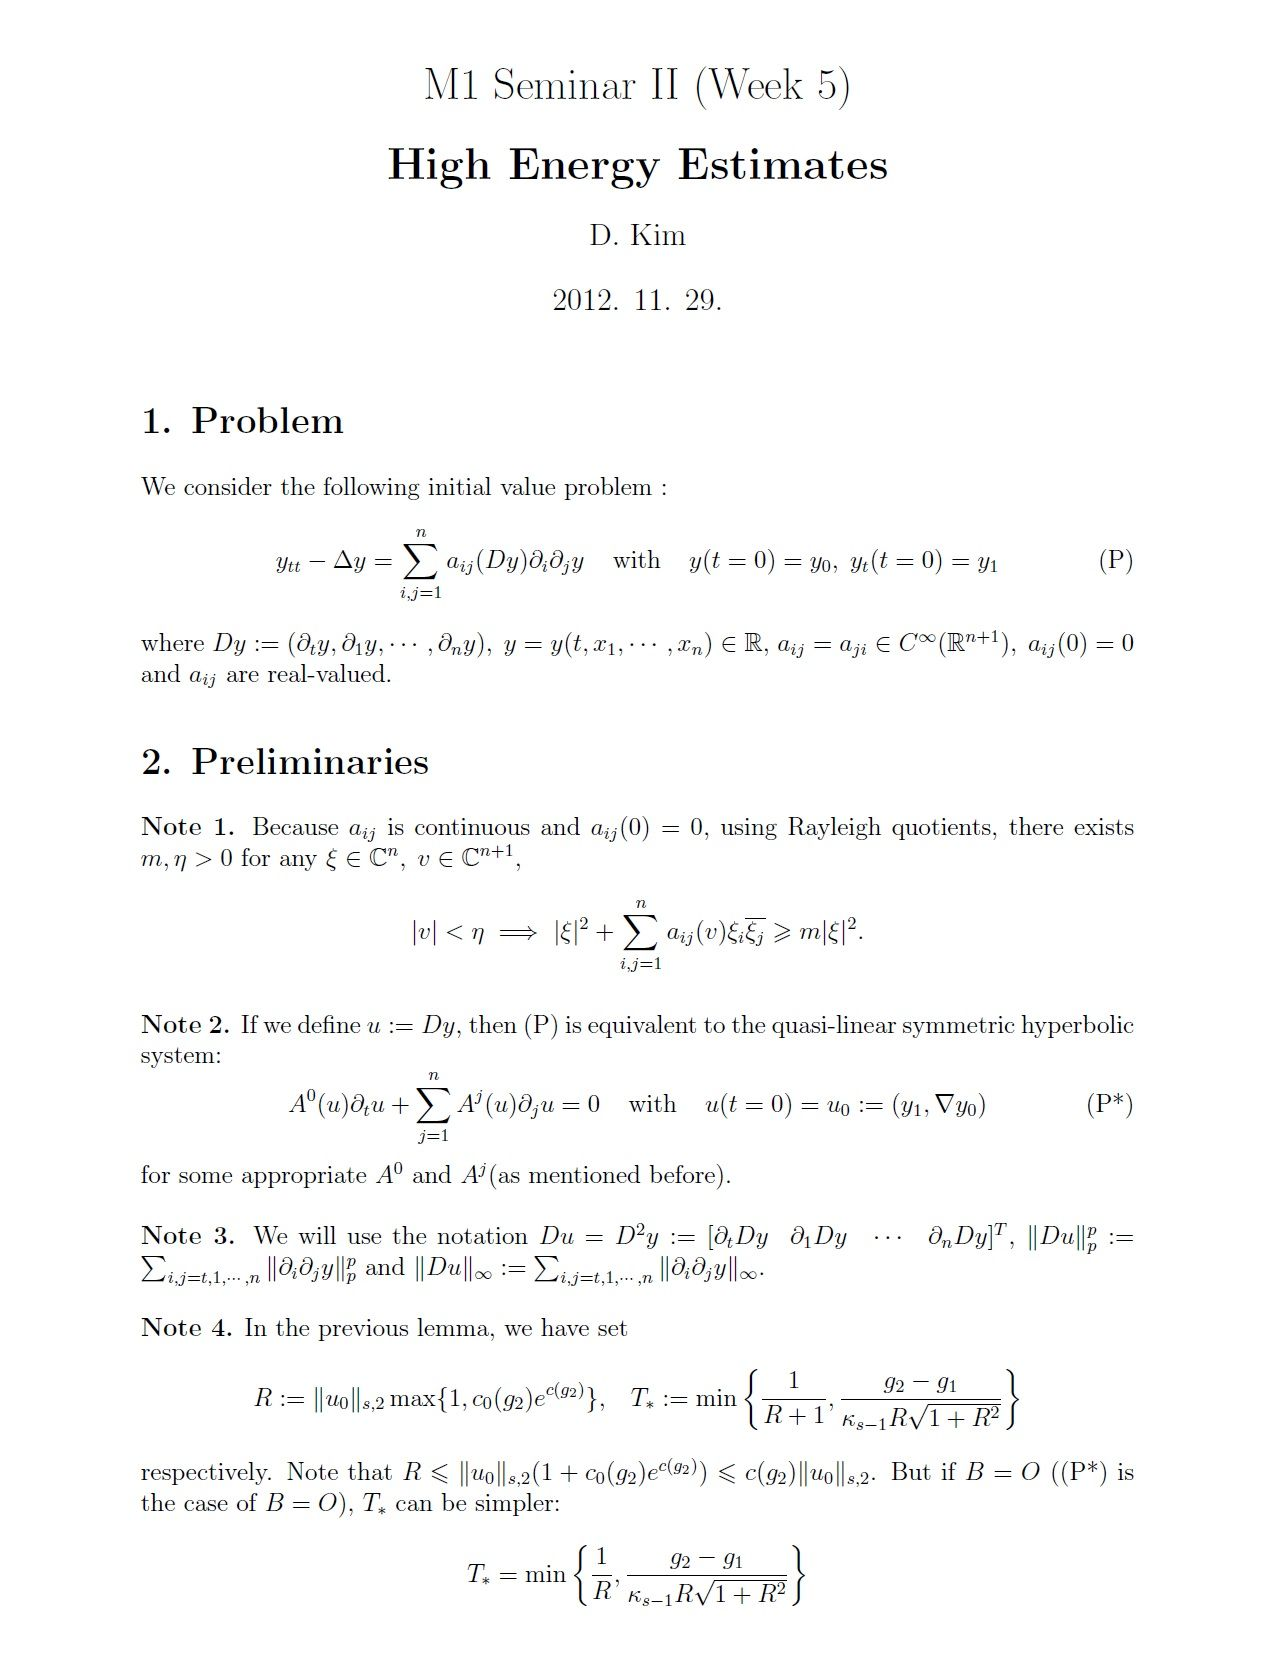 M1 Seminar II] Week 5 : High Energy Estimates #Math #Mathematics